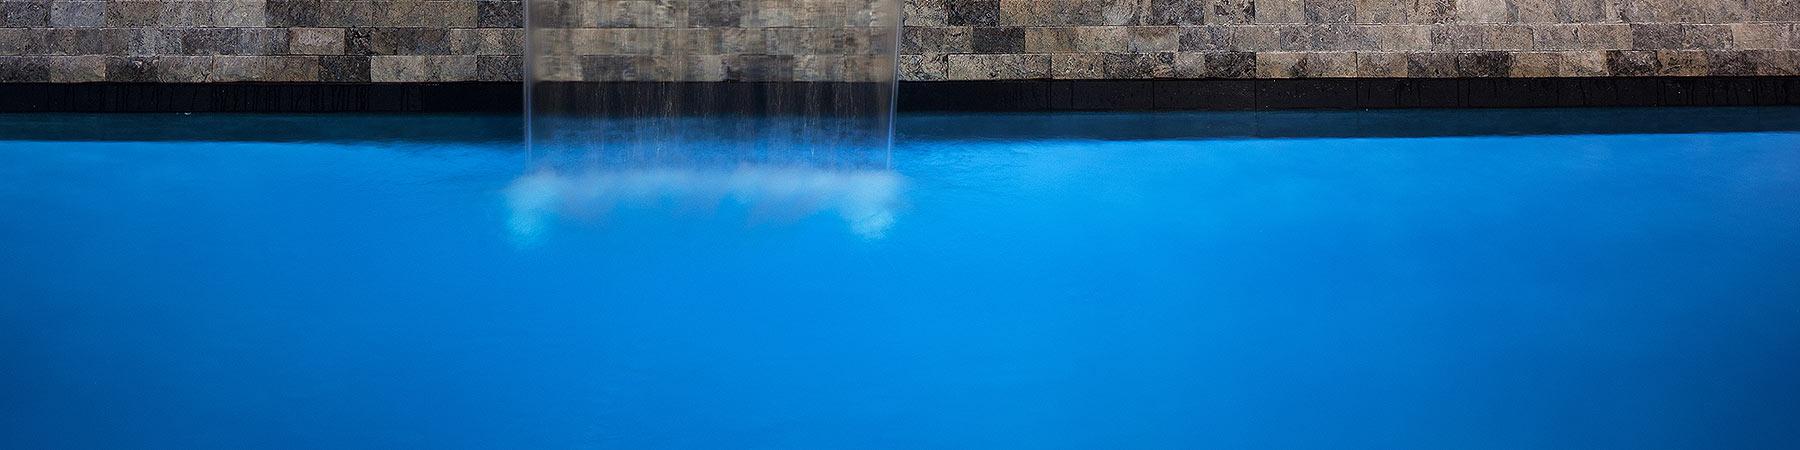 Swimming-Pool-Interior-Pacific-Blue